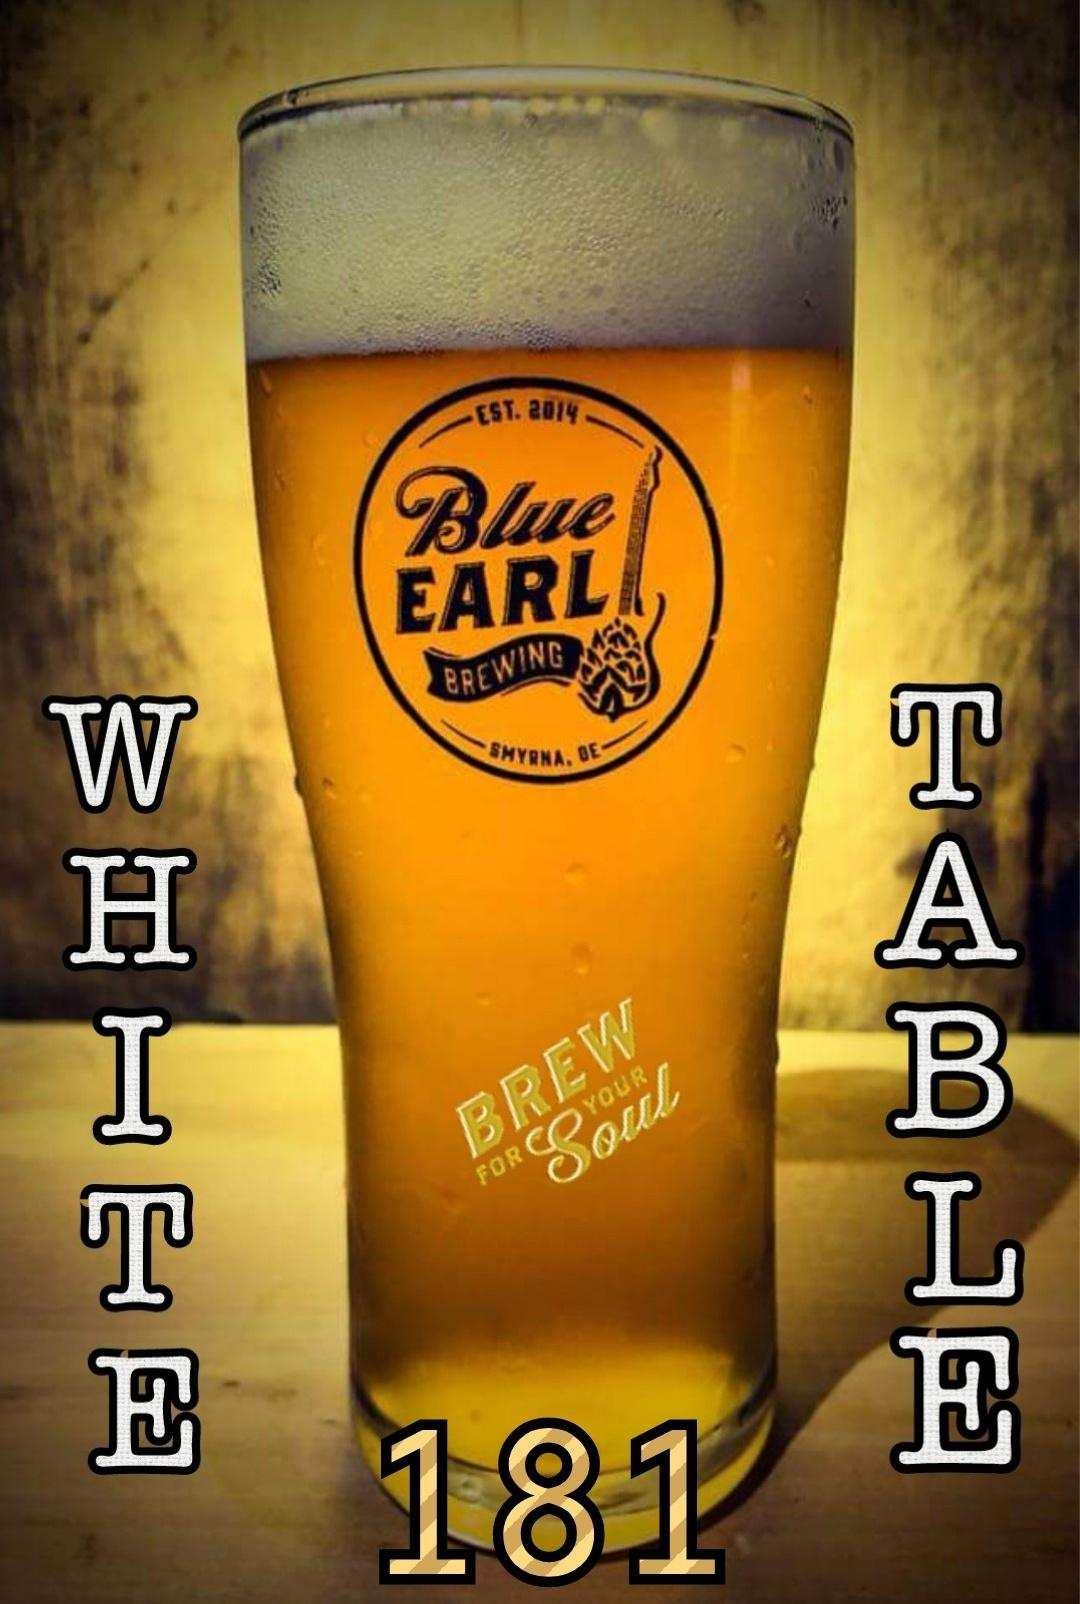 White Table 181 - Beer/Wine Hybrid